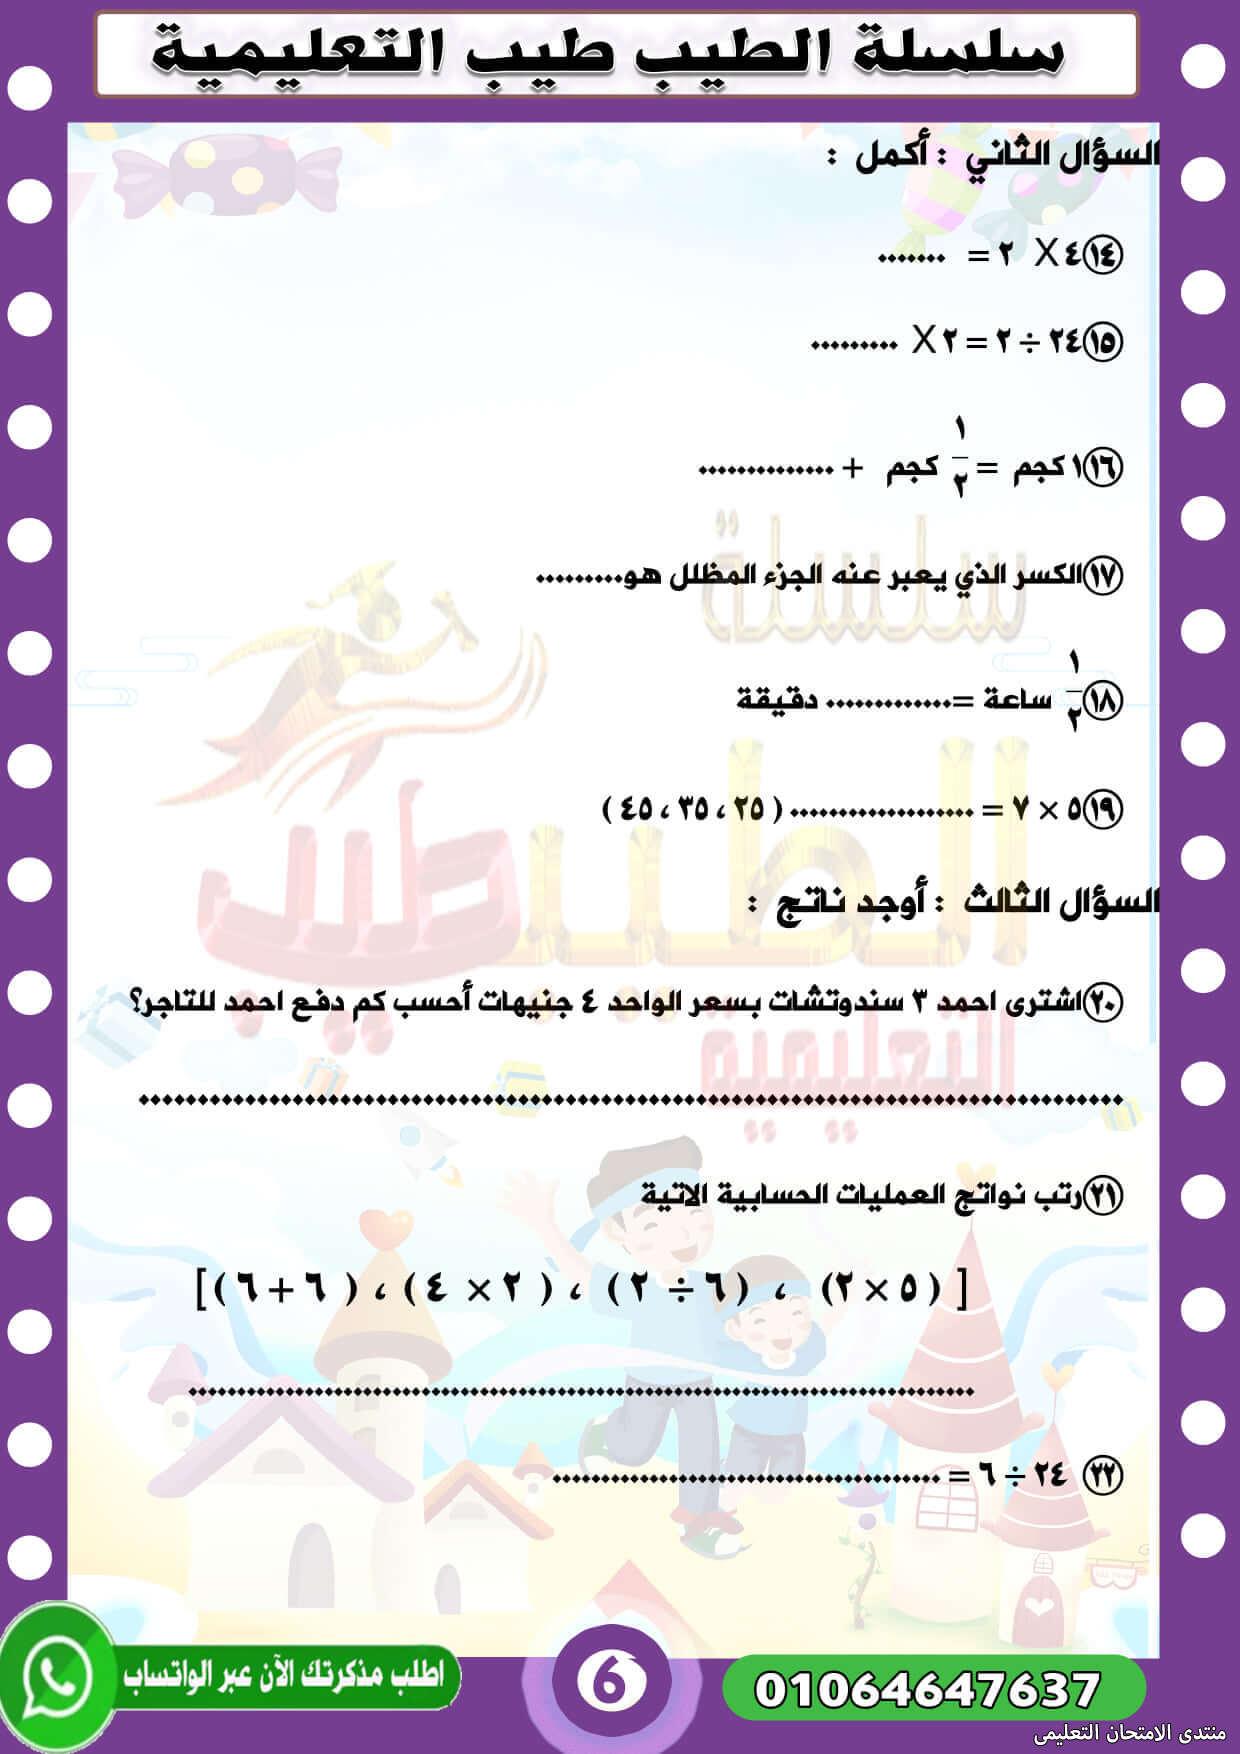 exam-eg.com_161835691817736.jpg